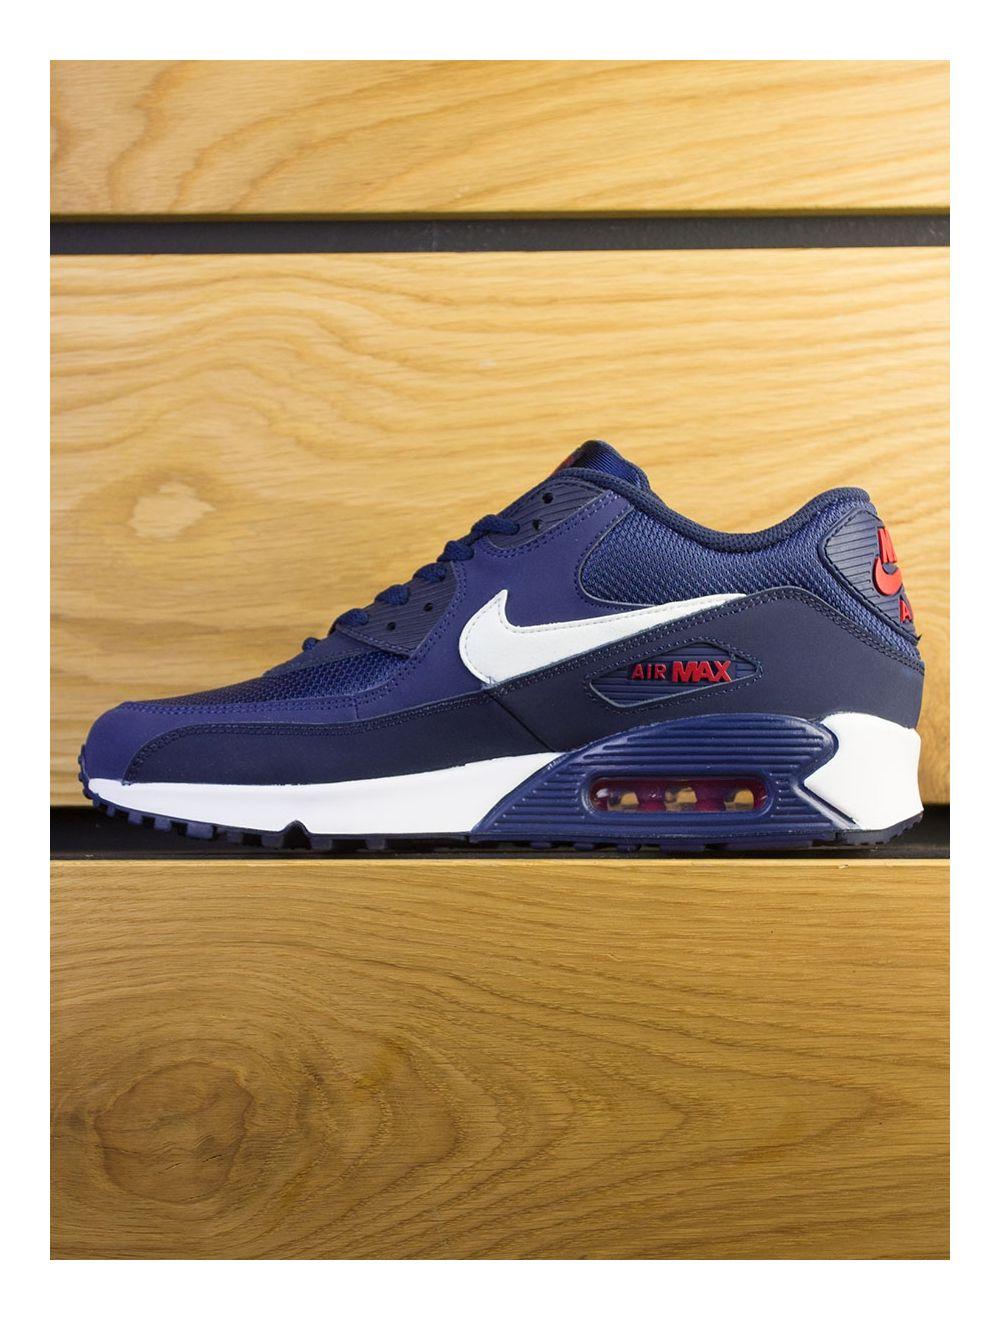 Nike Air Max 90 Essential Midnight Navy White